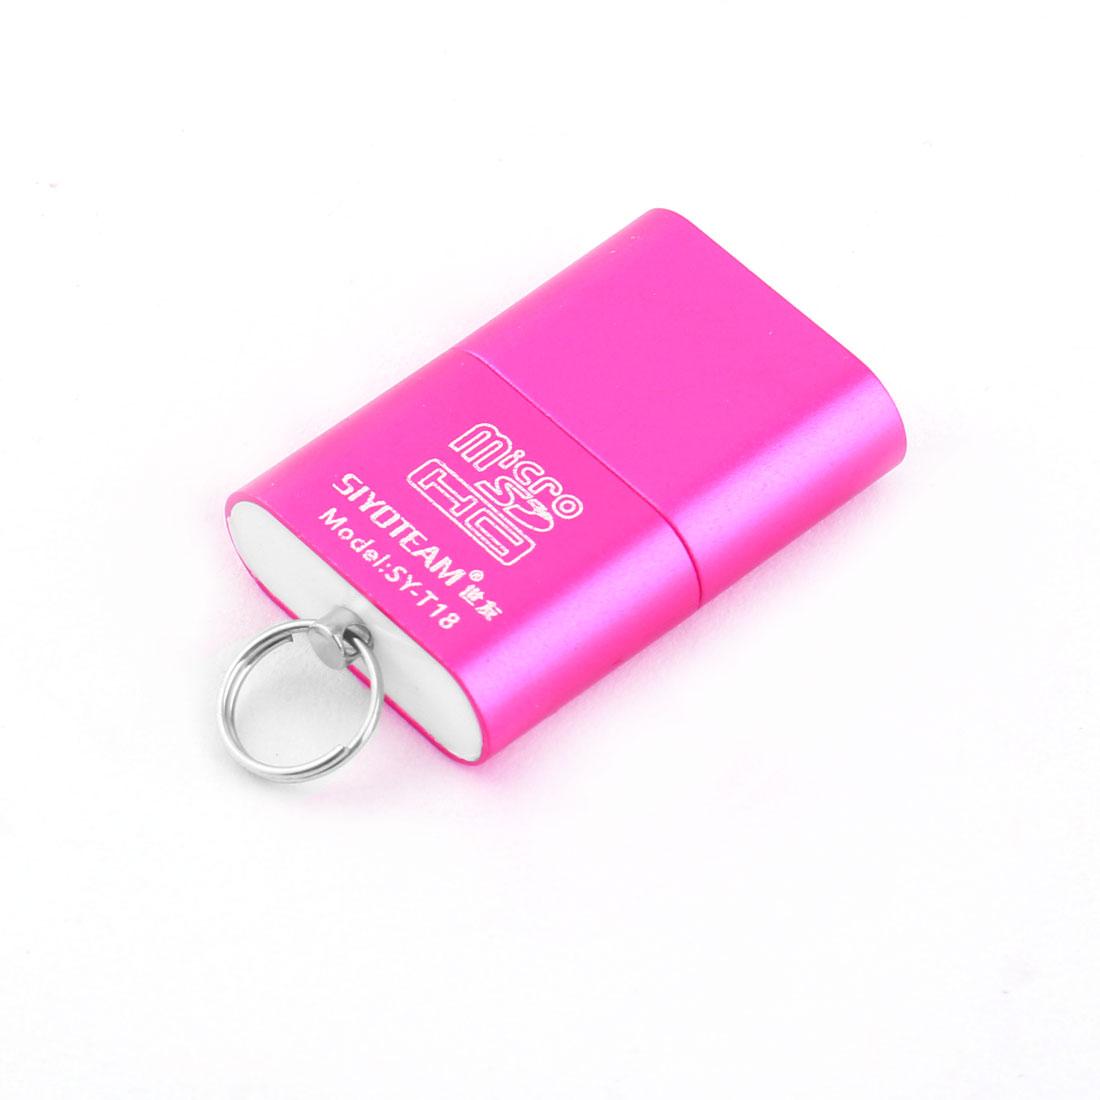 High Speed Mini USB 2.0 Micro SD T-Flash Memory Card Reader Adapter Fuchsia